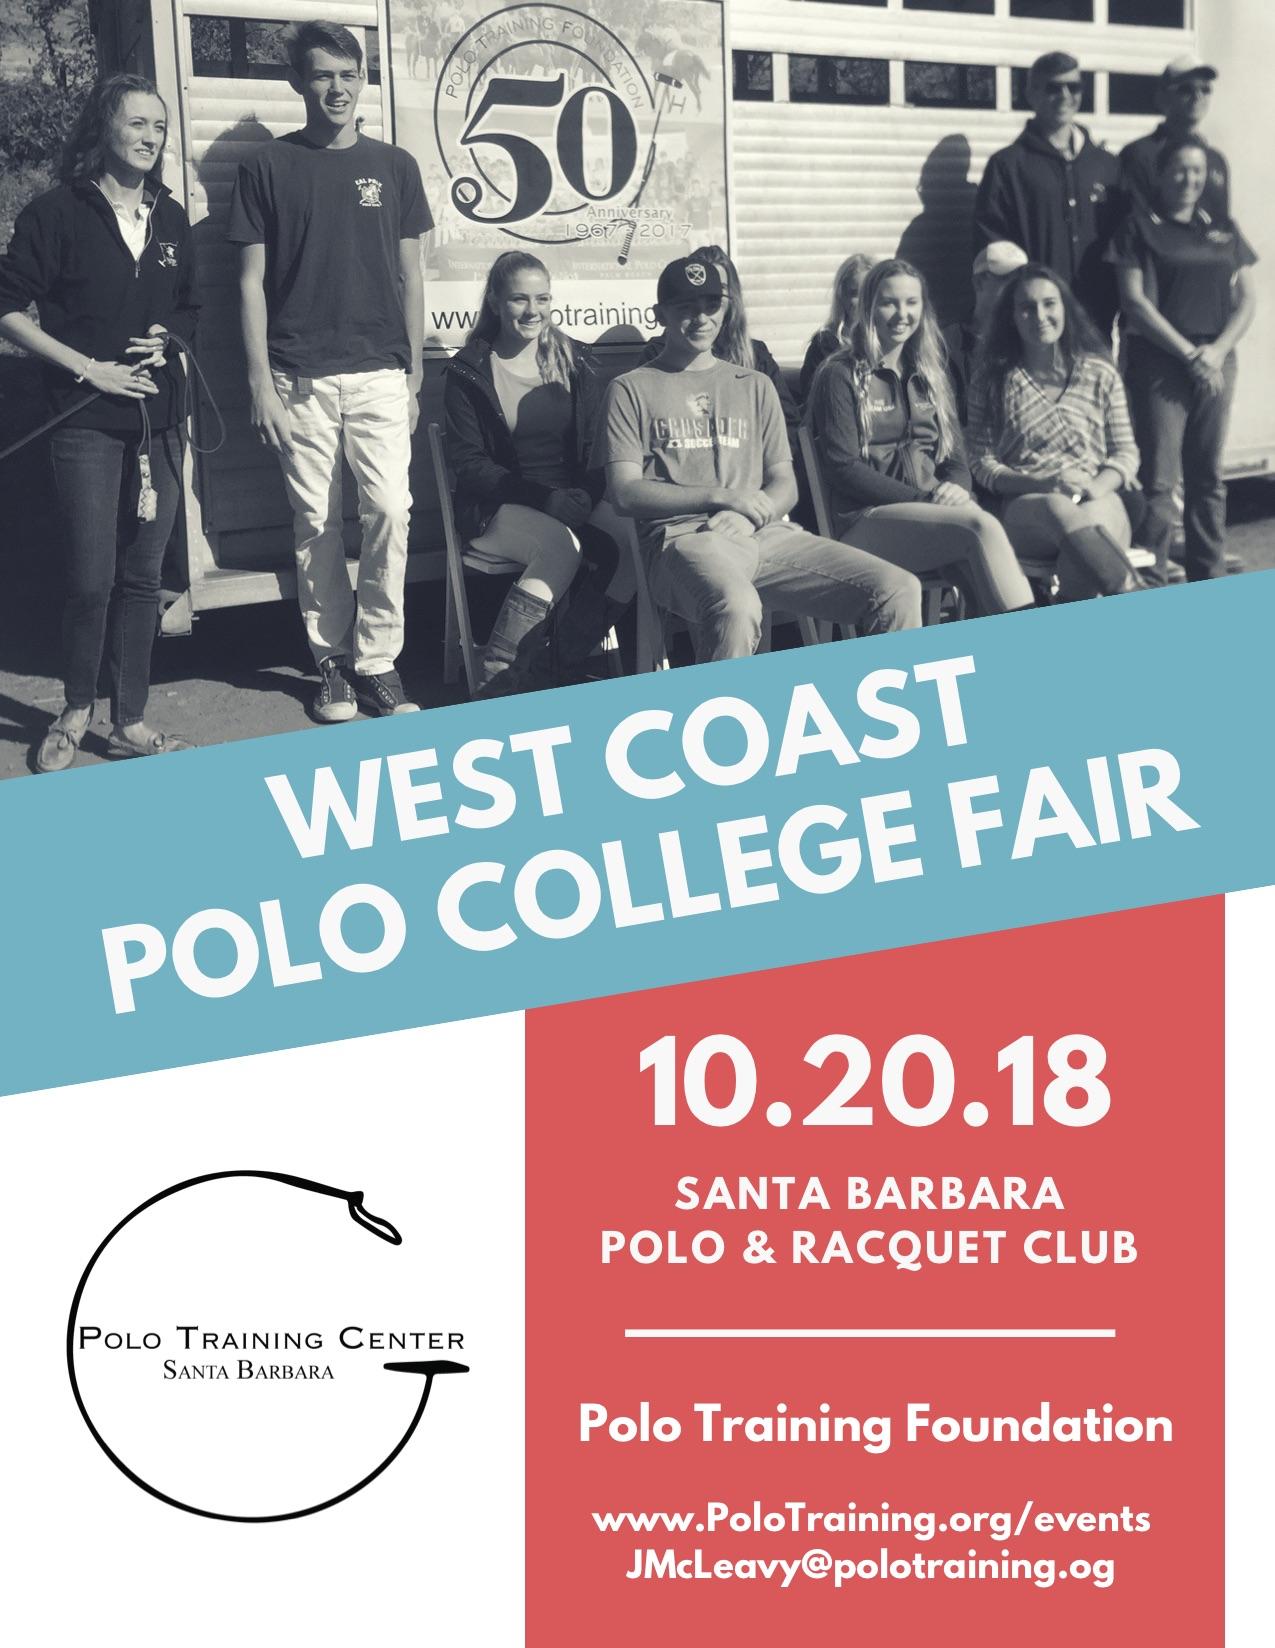 West Coast College Fair.jpg